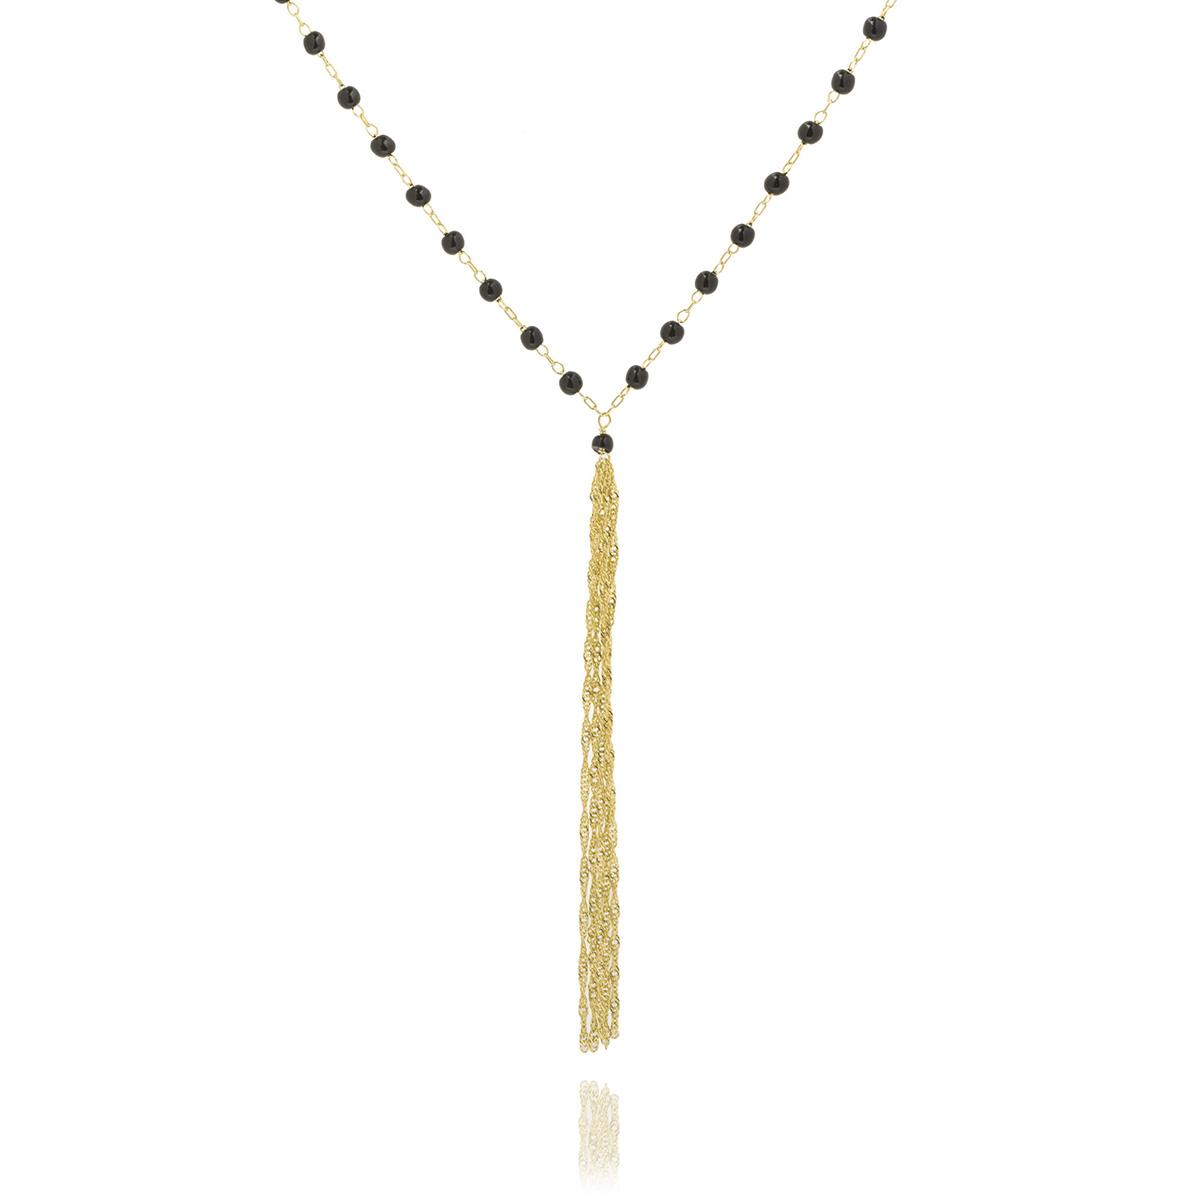 Colar Tassel Longo Semijoia em Ouro 18K com Cristal Ônix  - Soloyou